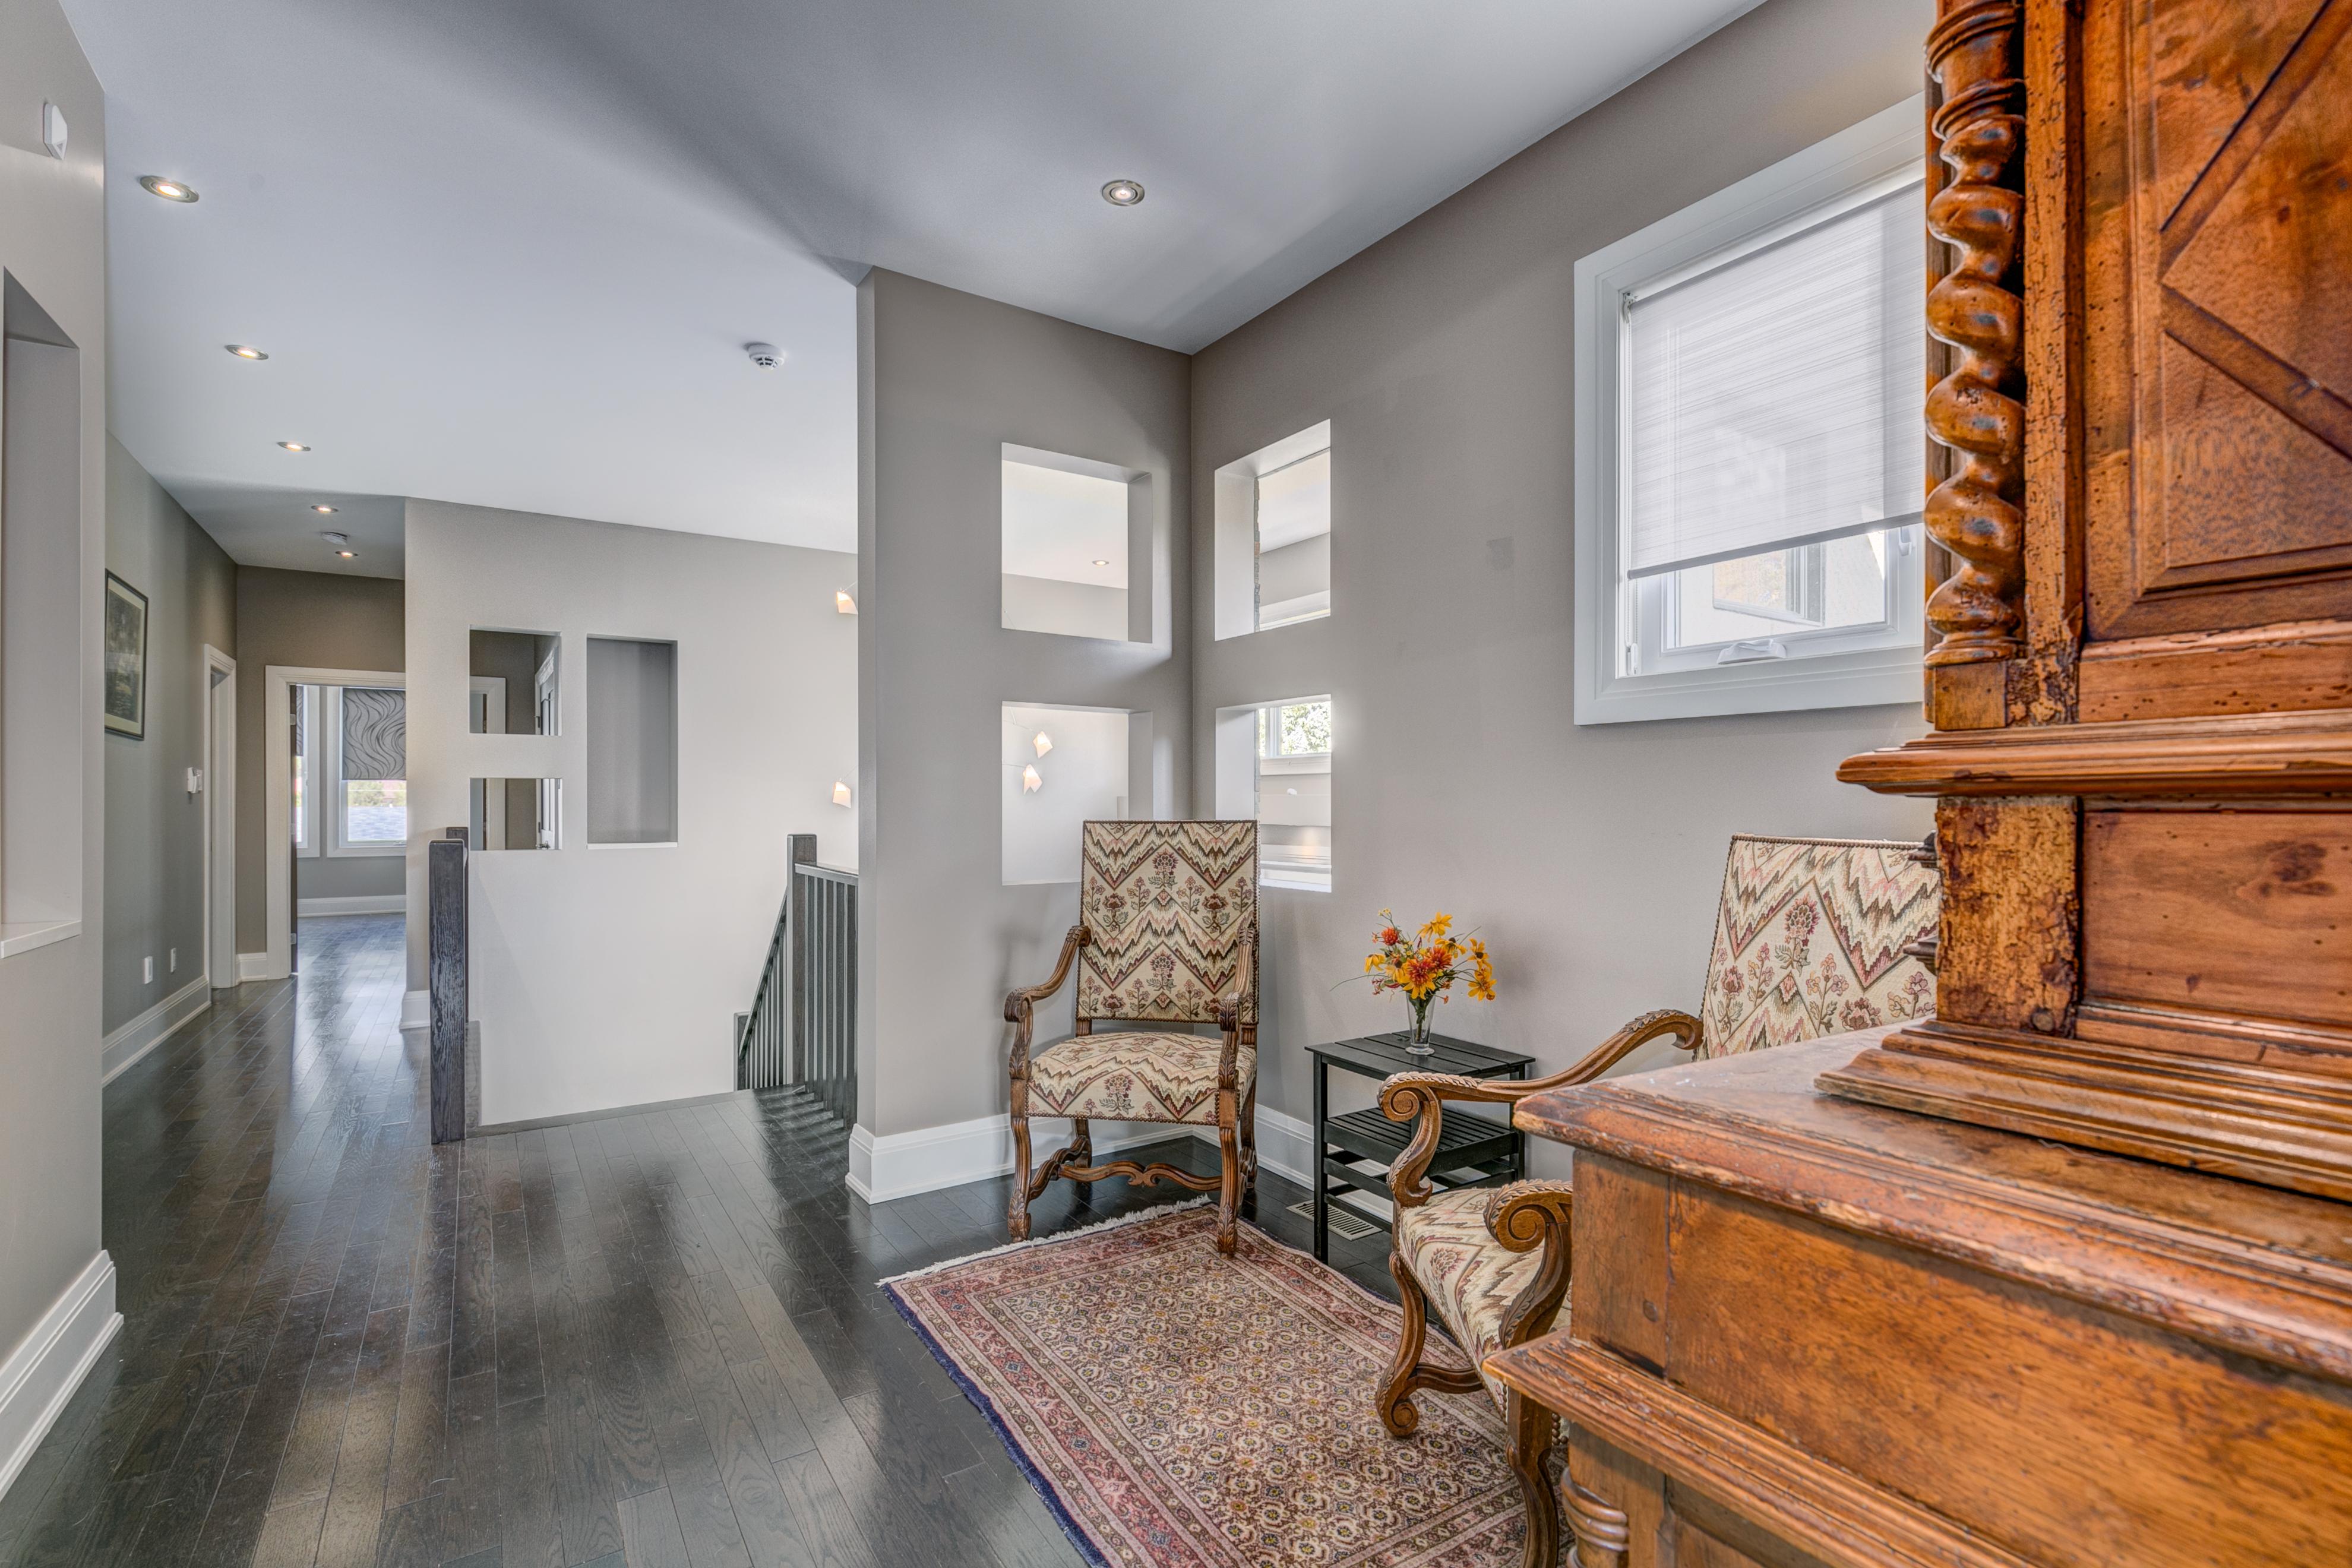 1601Kingsdale Upper Sitting Room